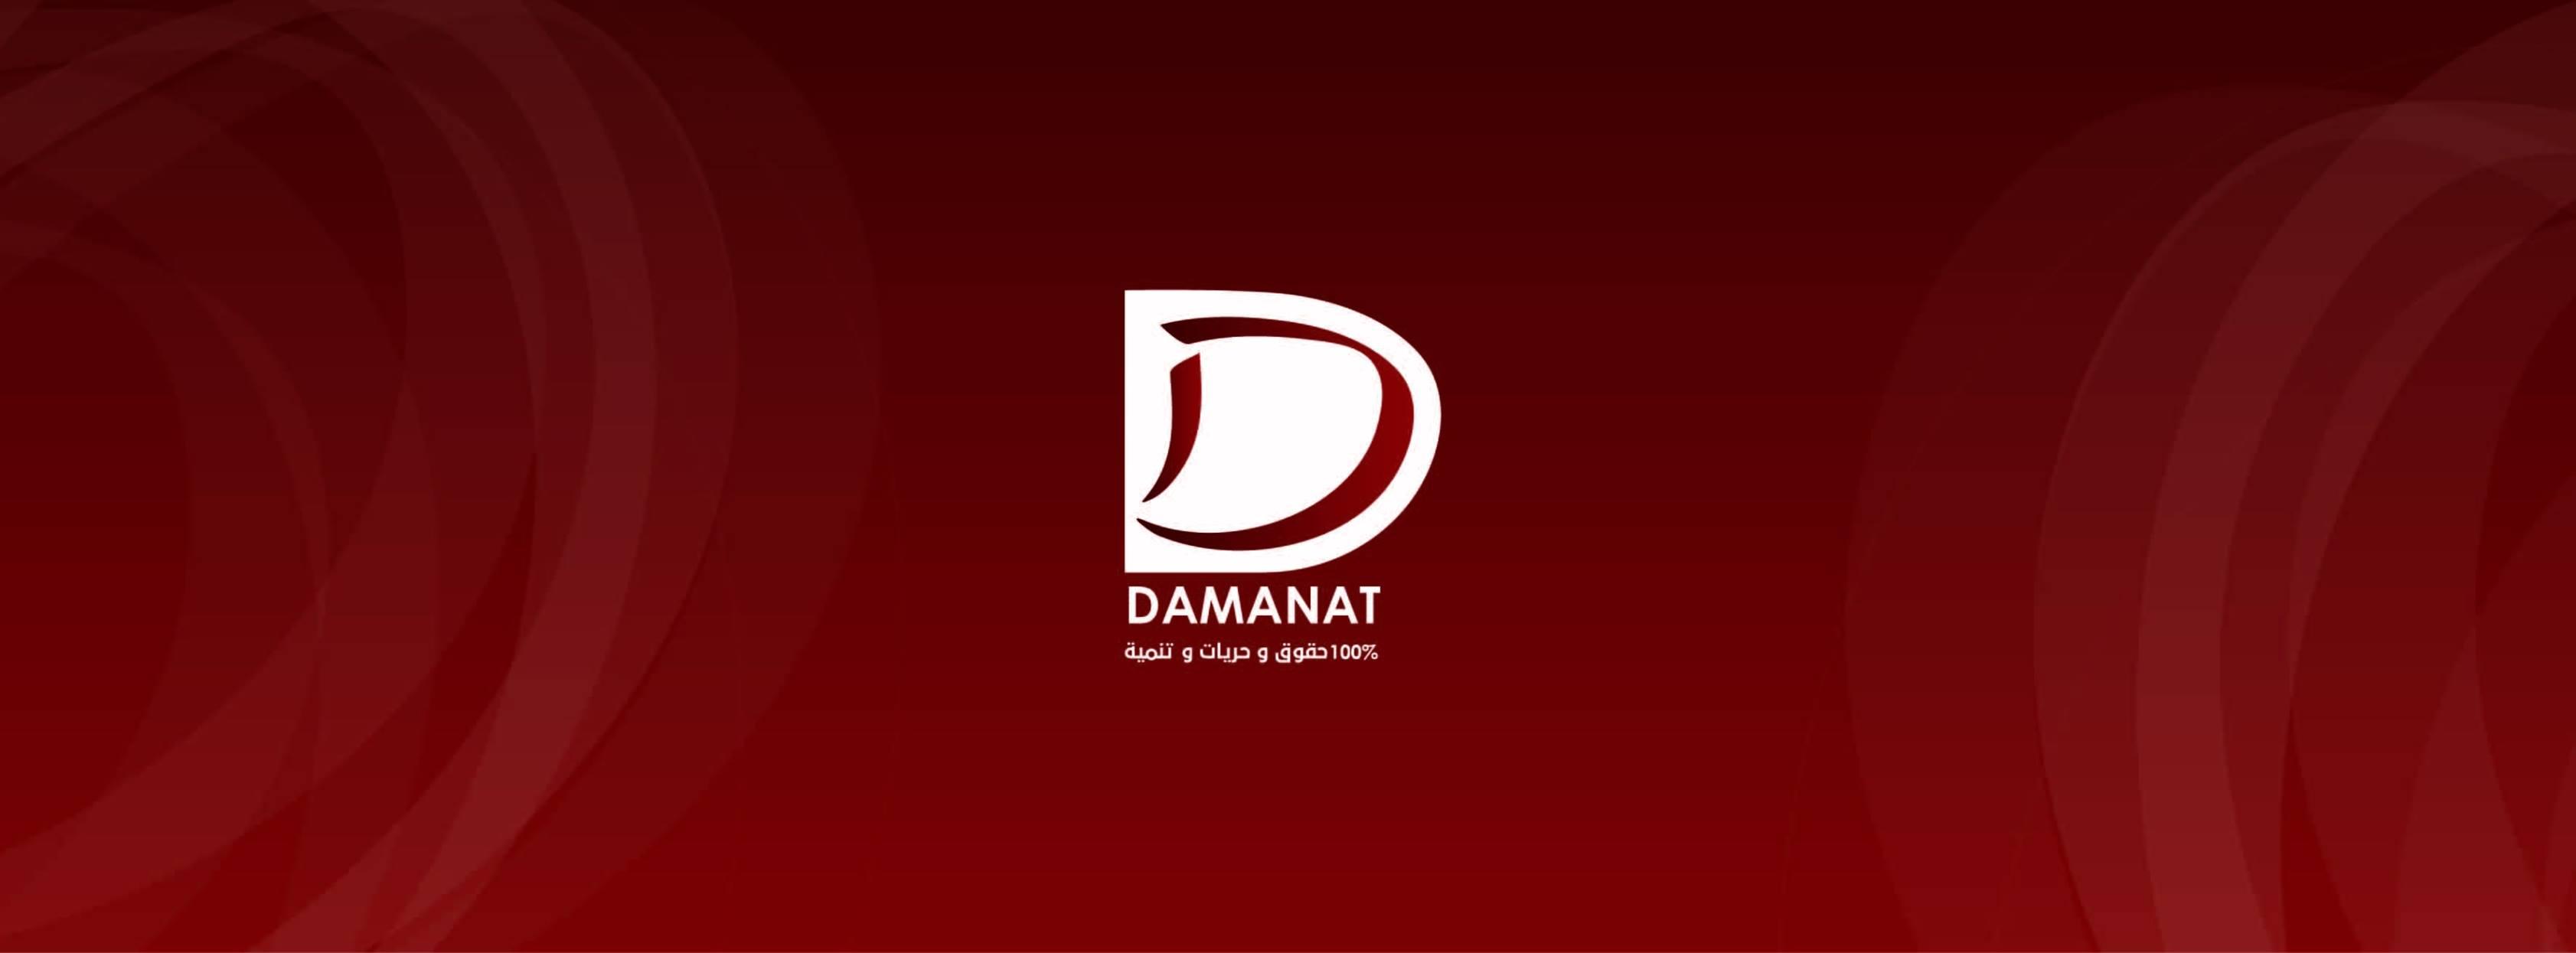 Damanat